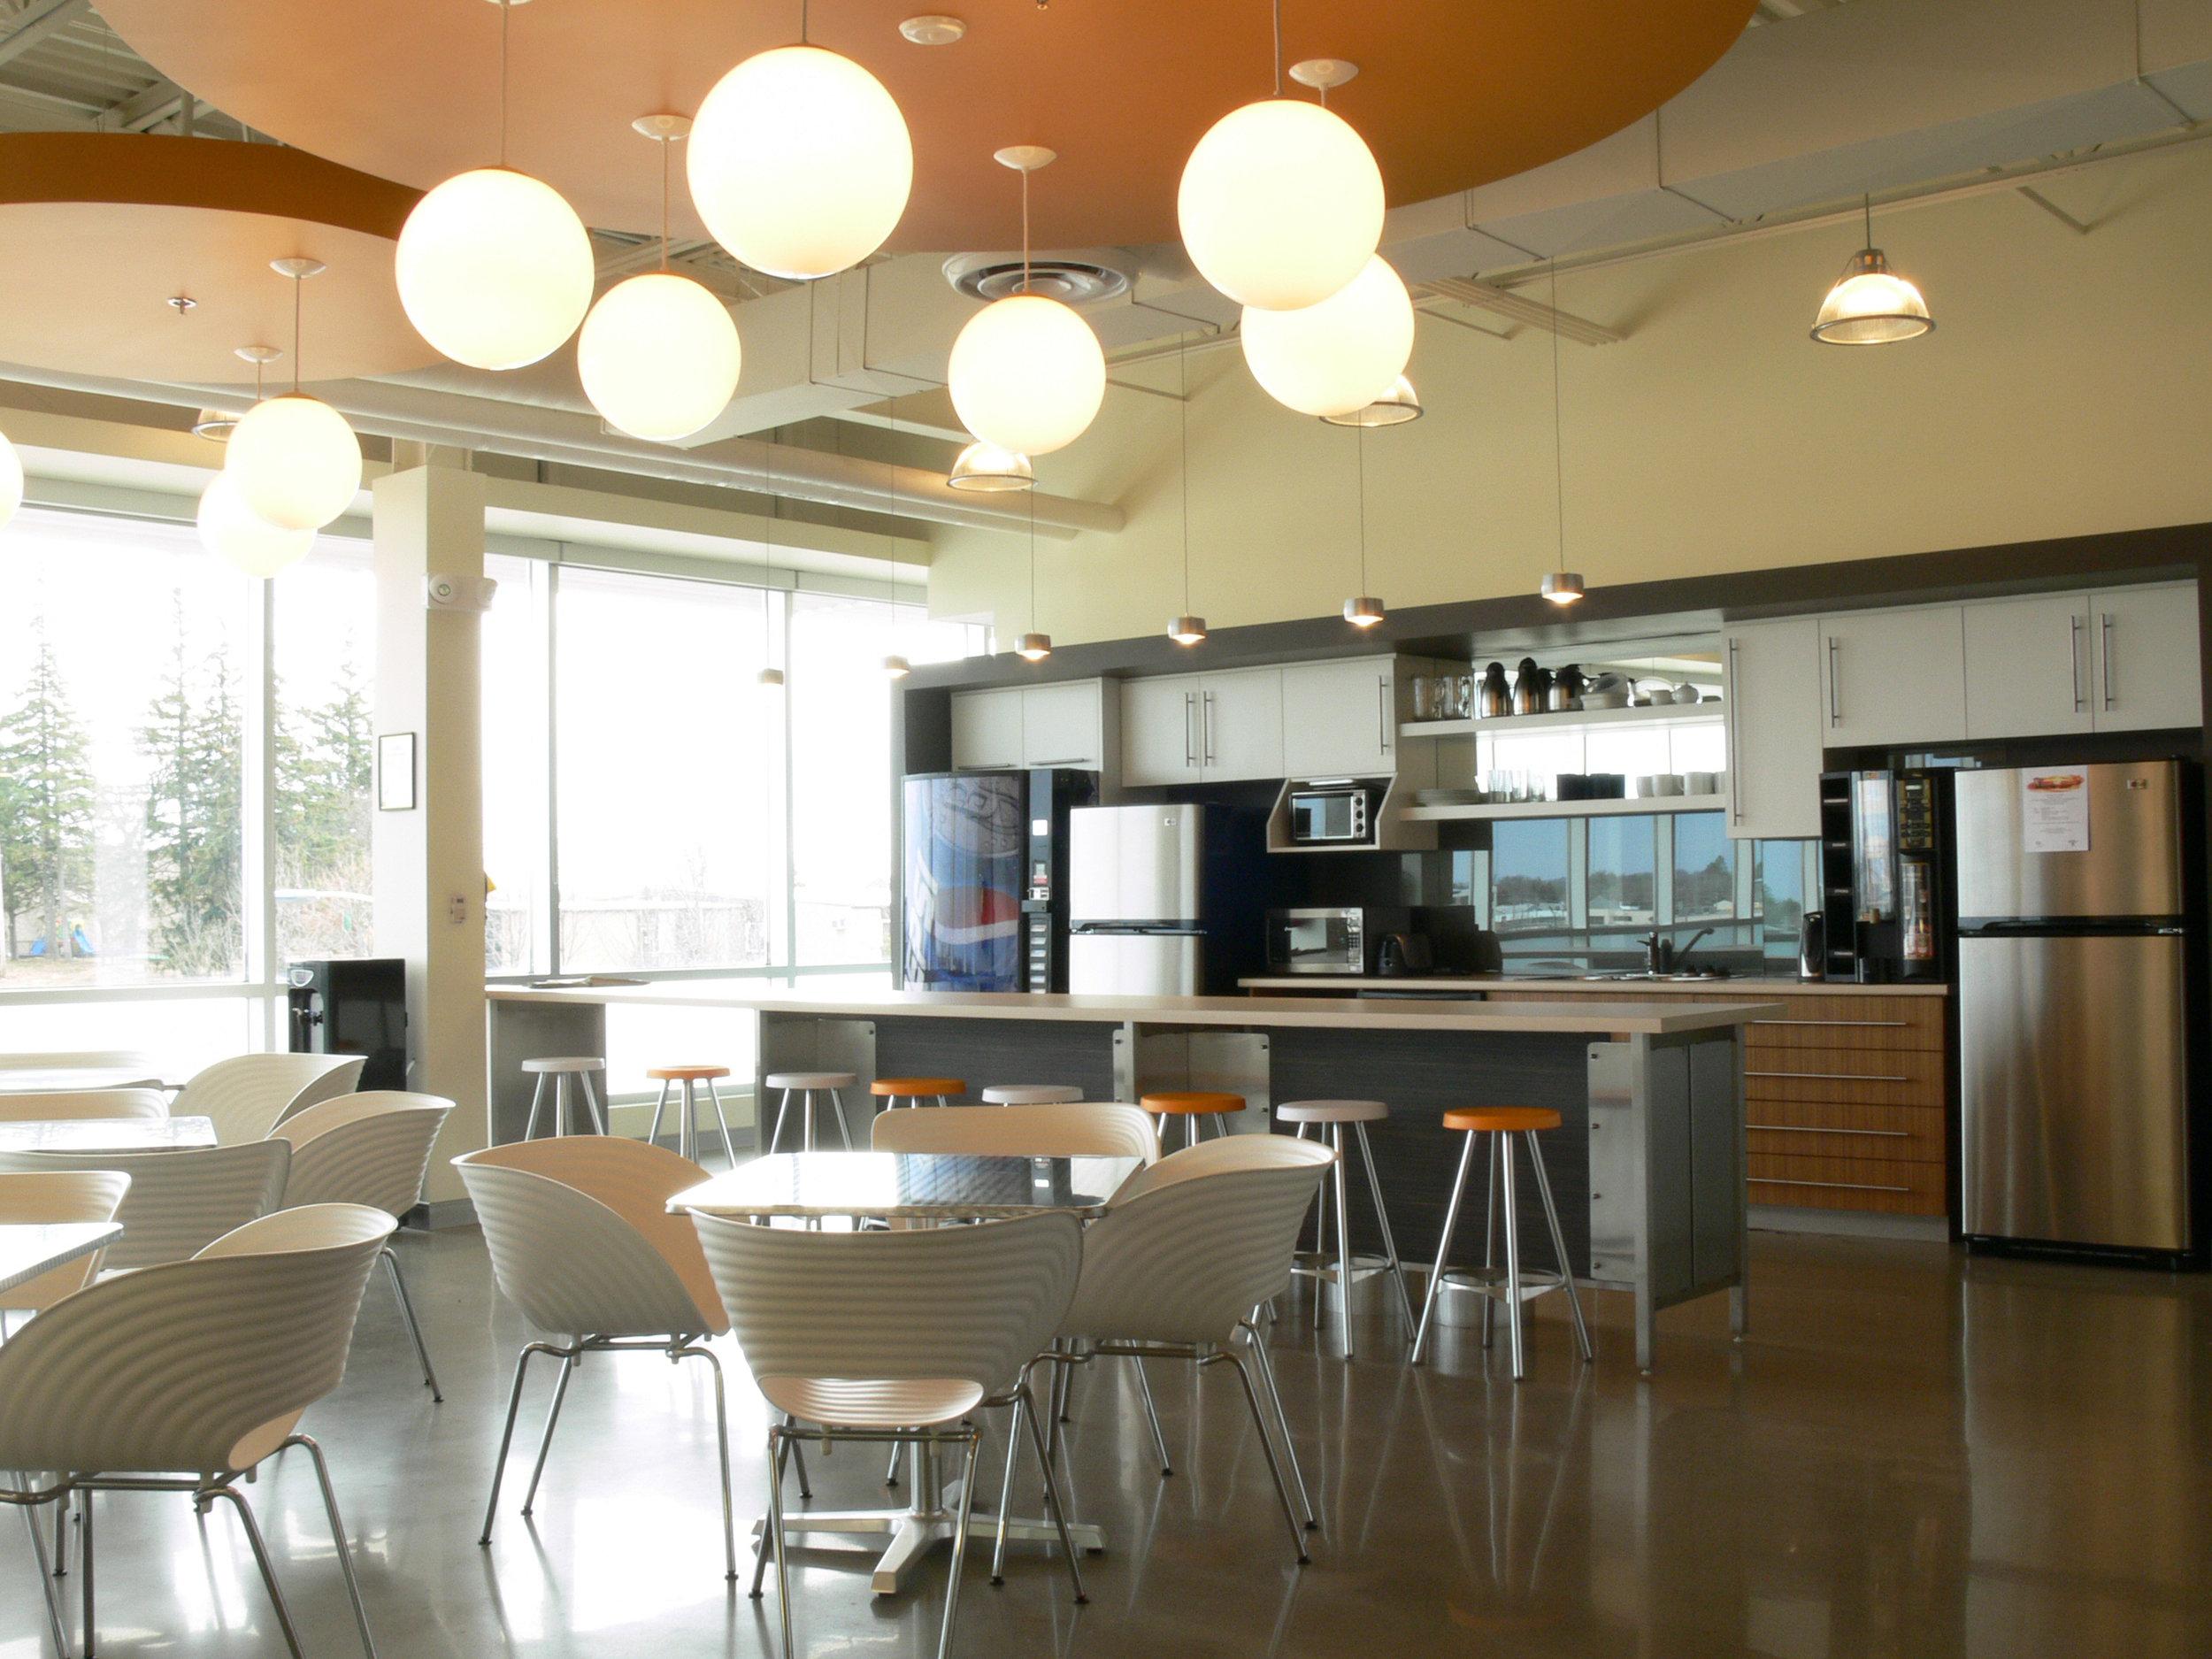 Cafeteria 4.jpg